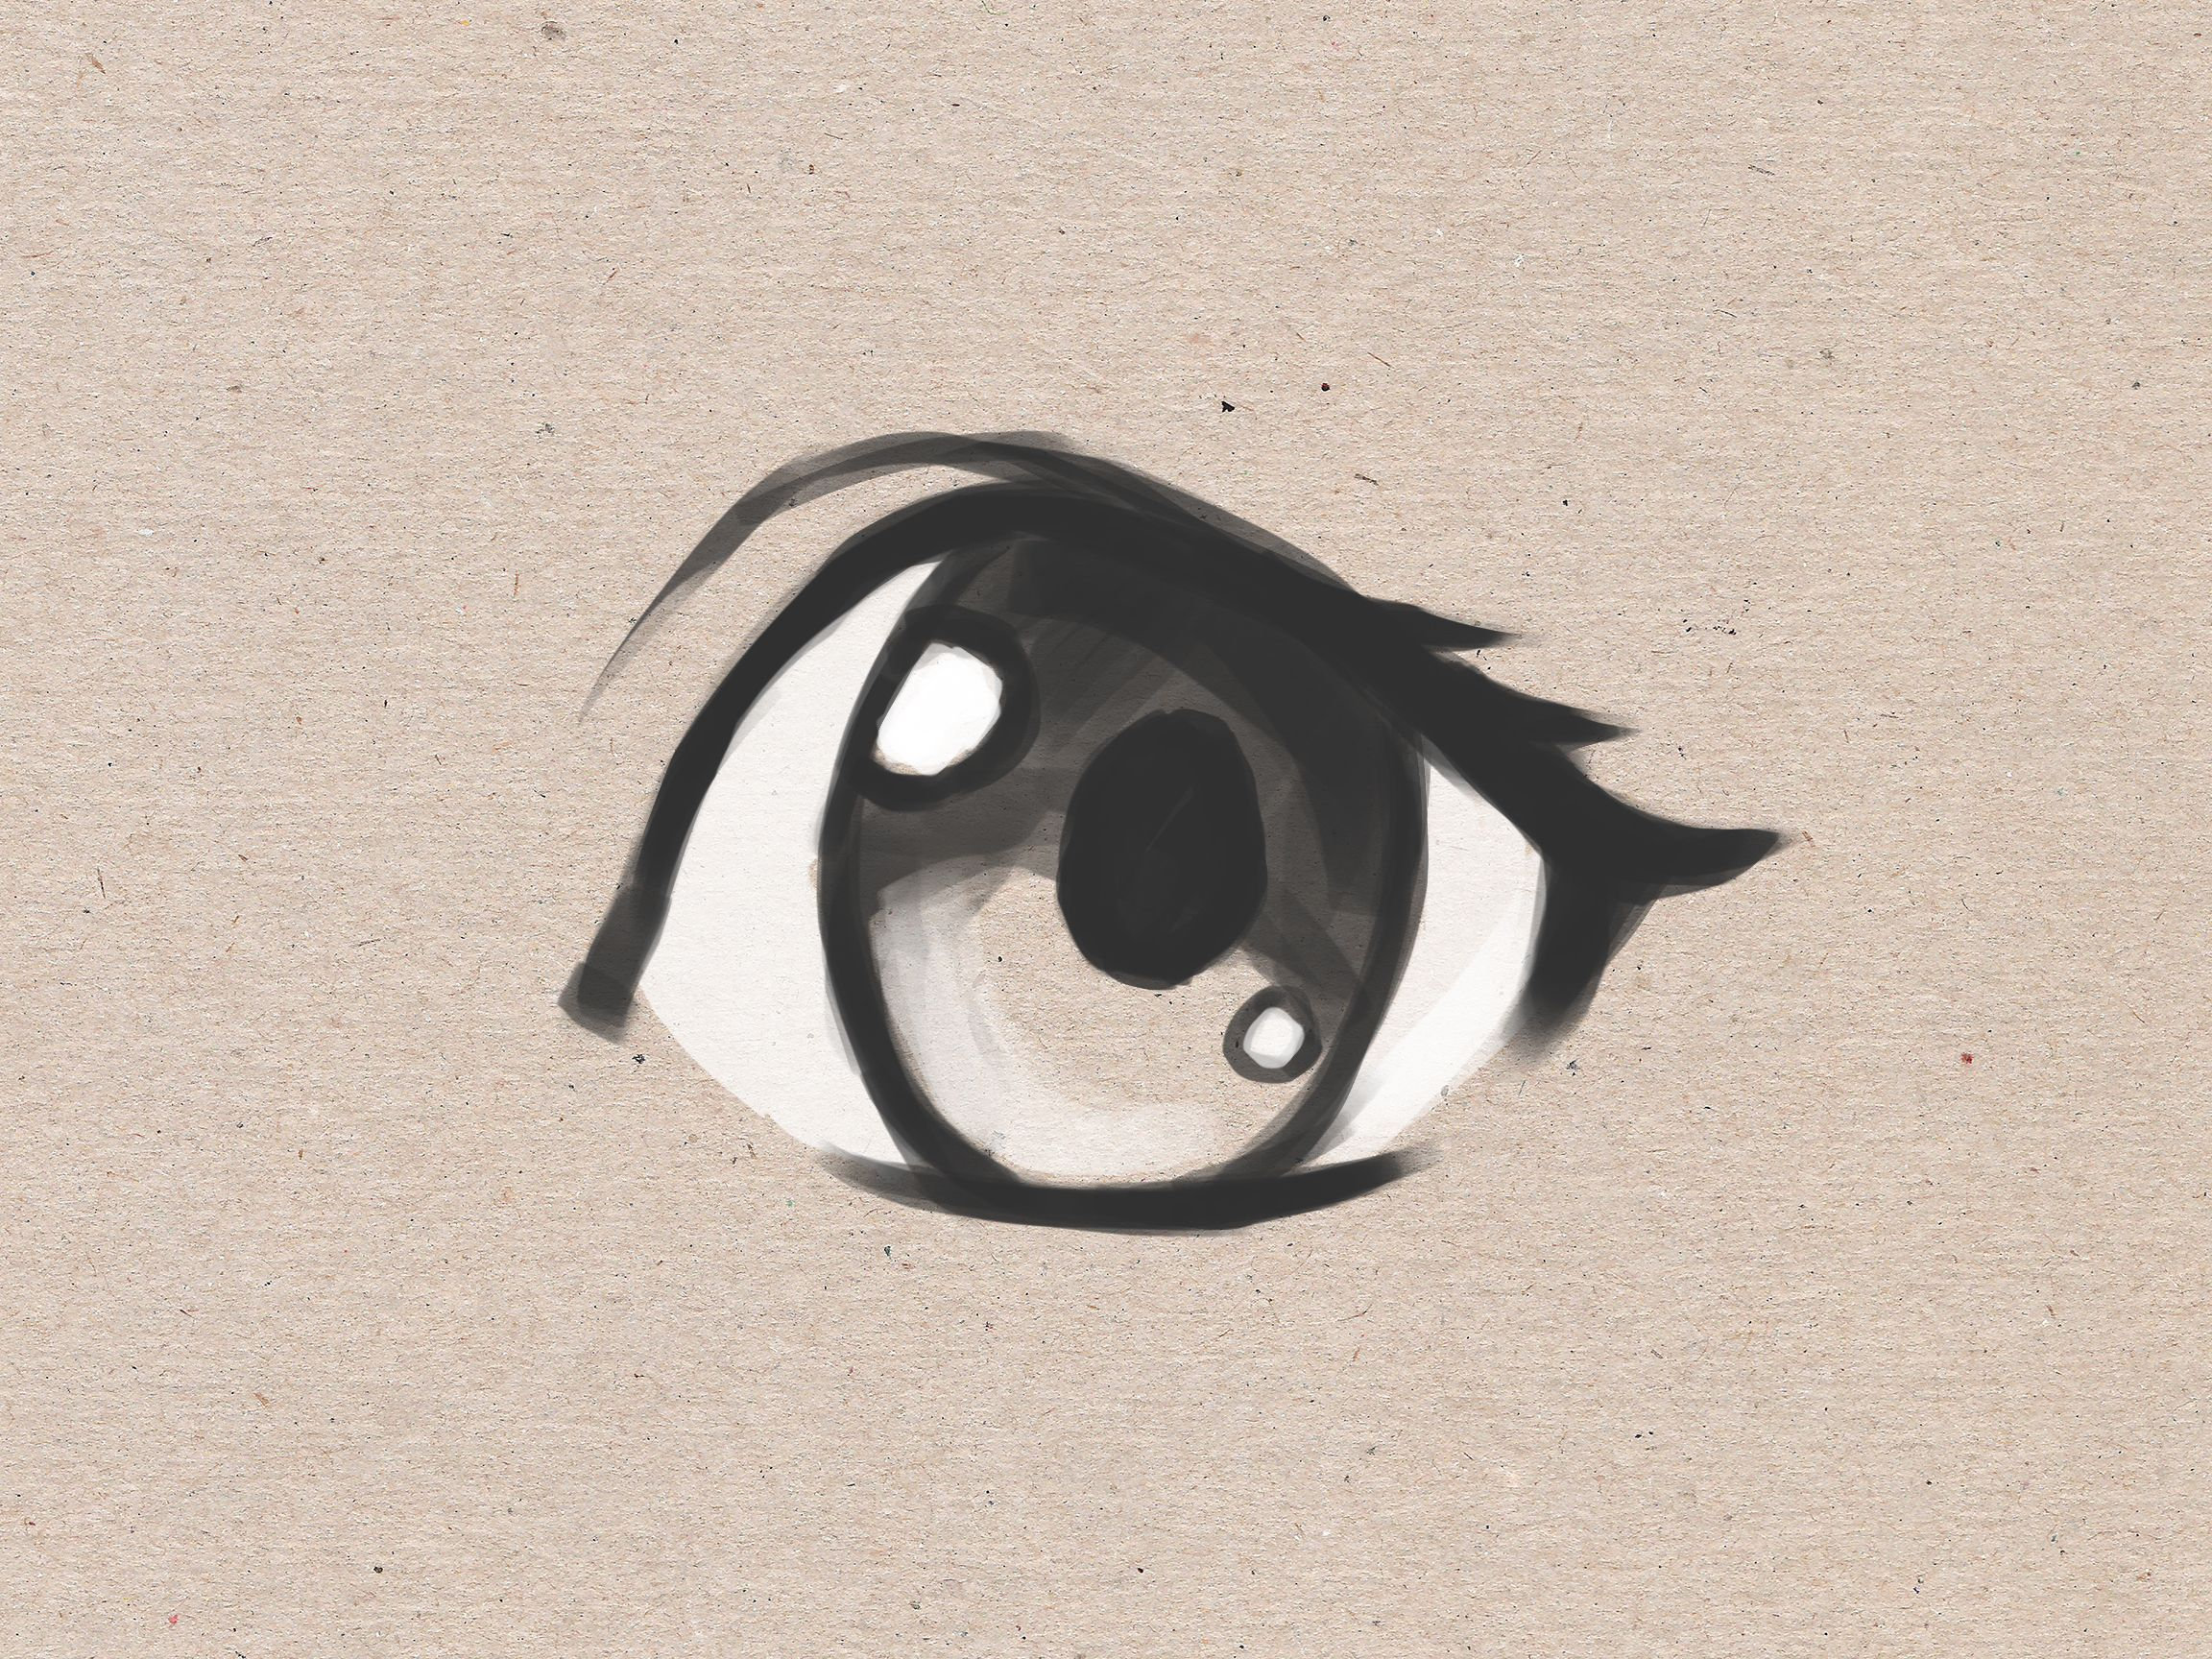 How To Draw Simple Anime Eyes Via Wikihow Com Easy Anime Eyes Eye Drawing Simple Simple Anime